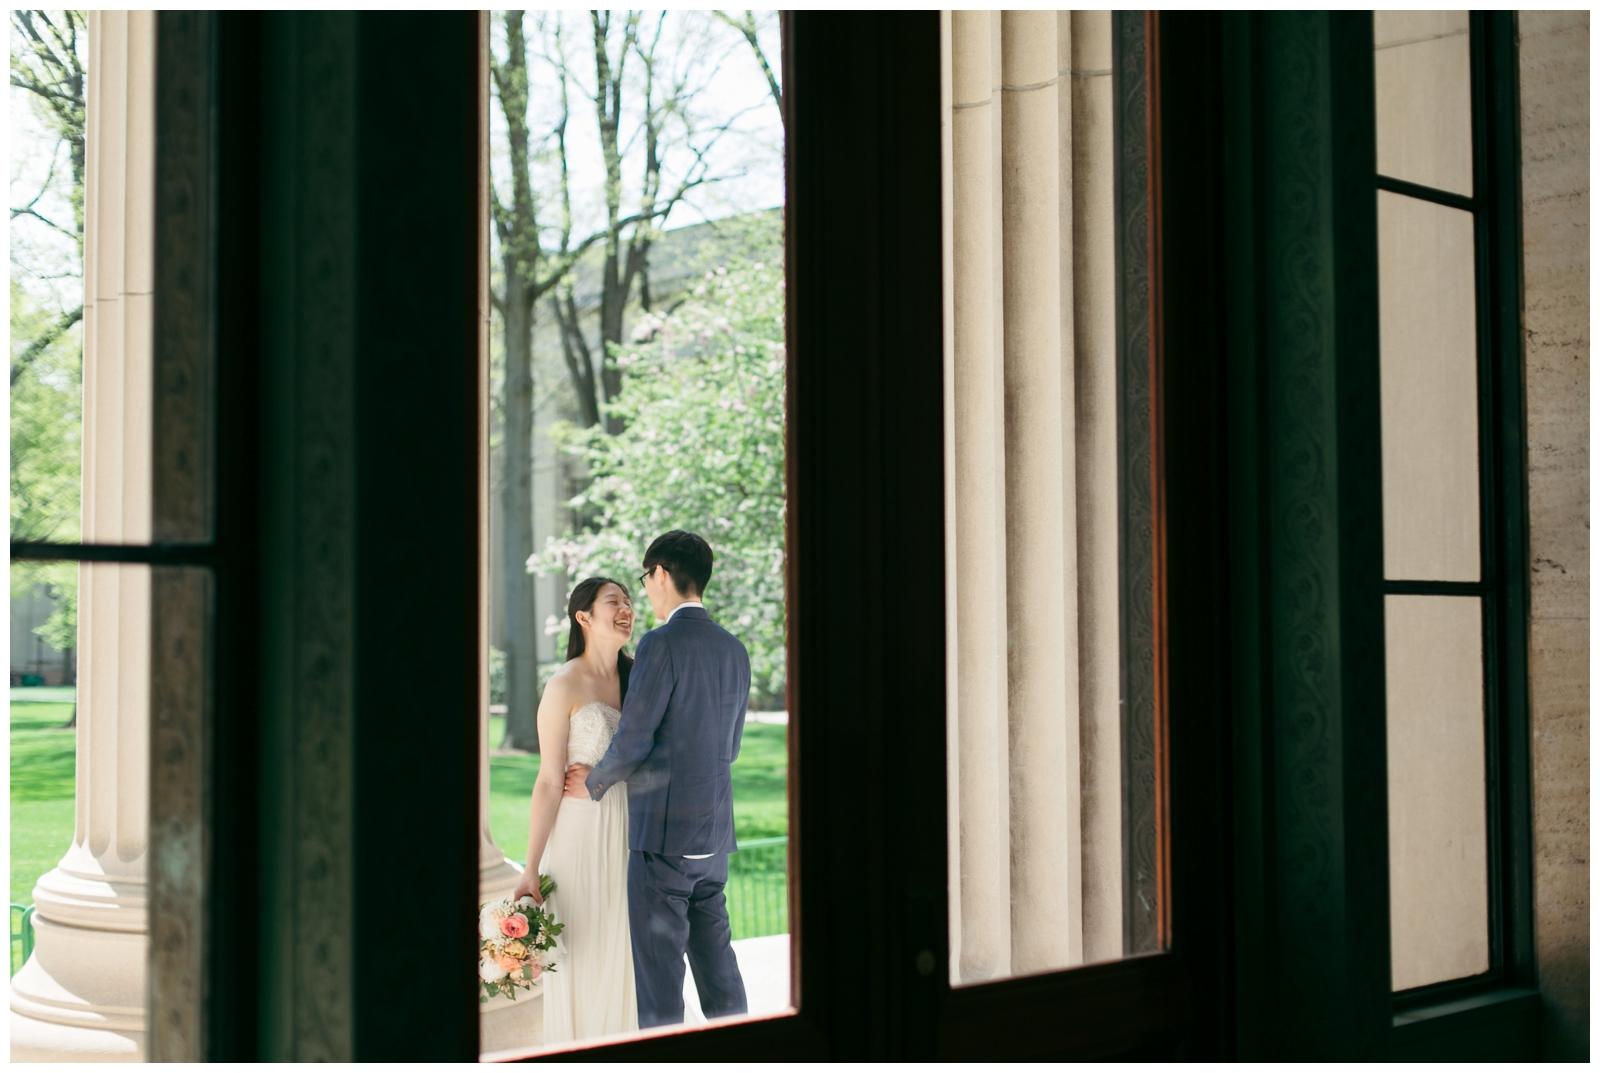 Samberg-Conference-Center-Boston-Wedding-Photographer-Bailey-Q-Photo-079.jpg